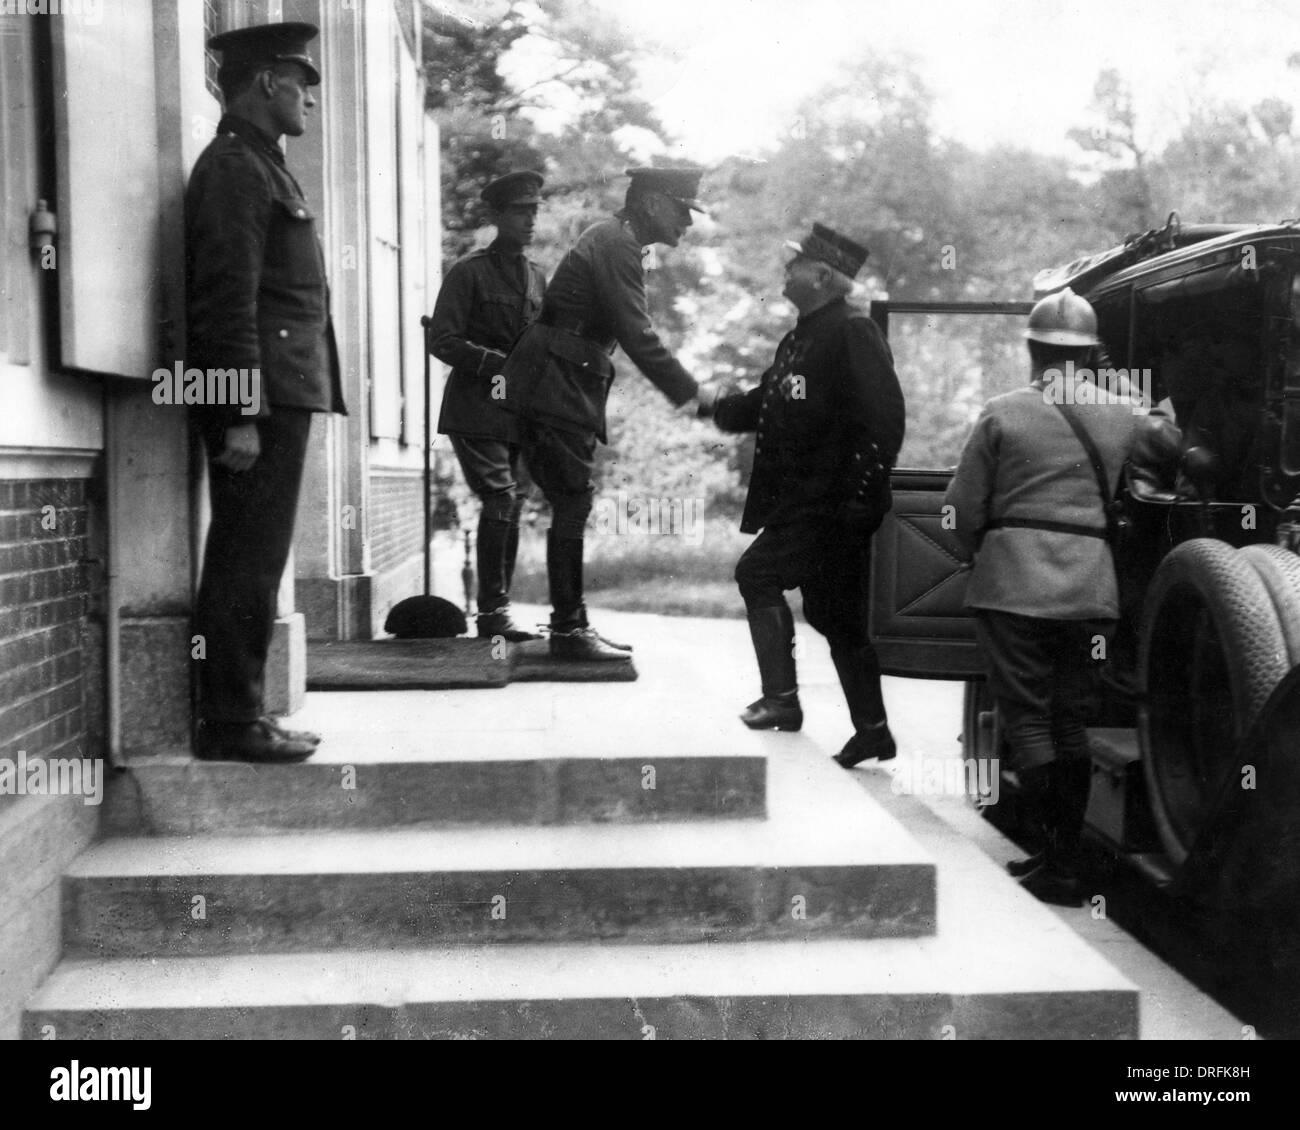 Sir Douglas Haig meeting General Joffre, Montreuil - Stock Image